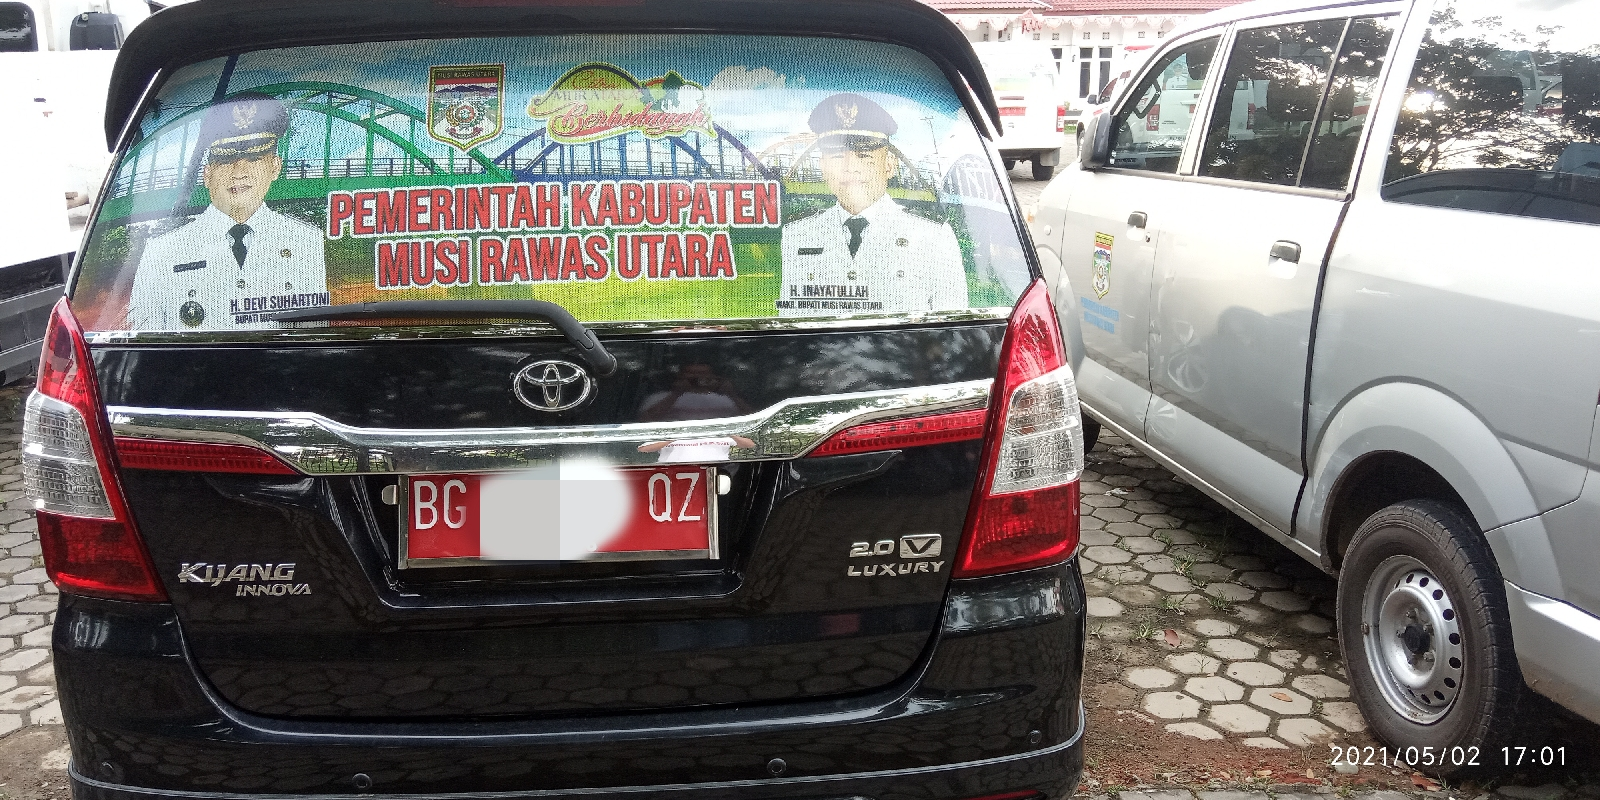 Contoh kendaraan Dinas yang telah terpasang stiker. (Poto/ari)